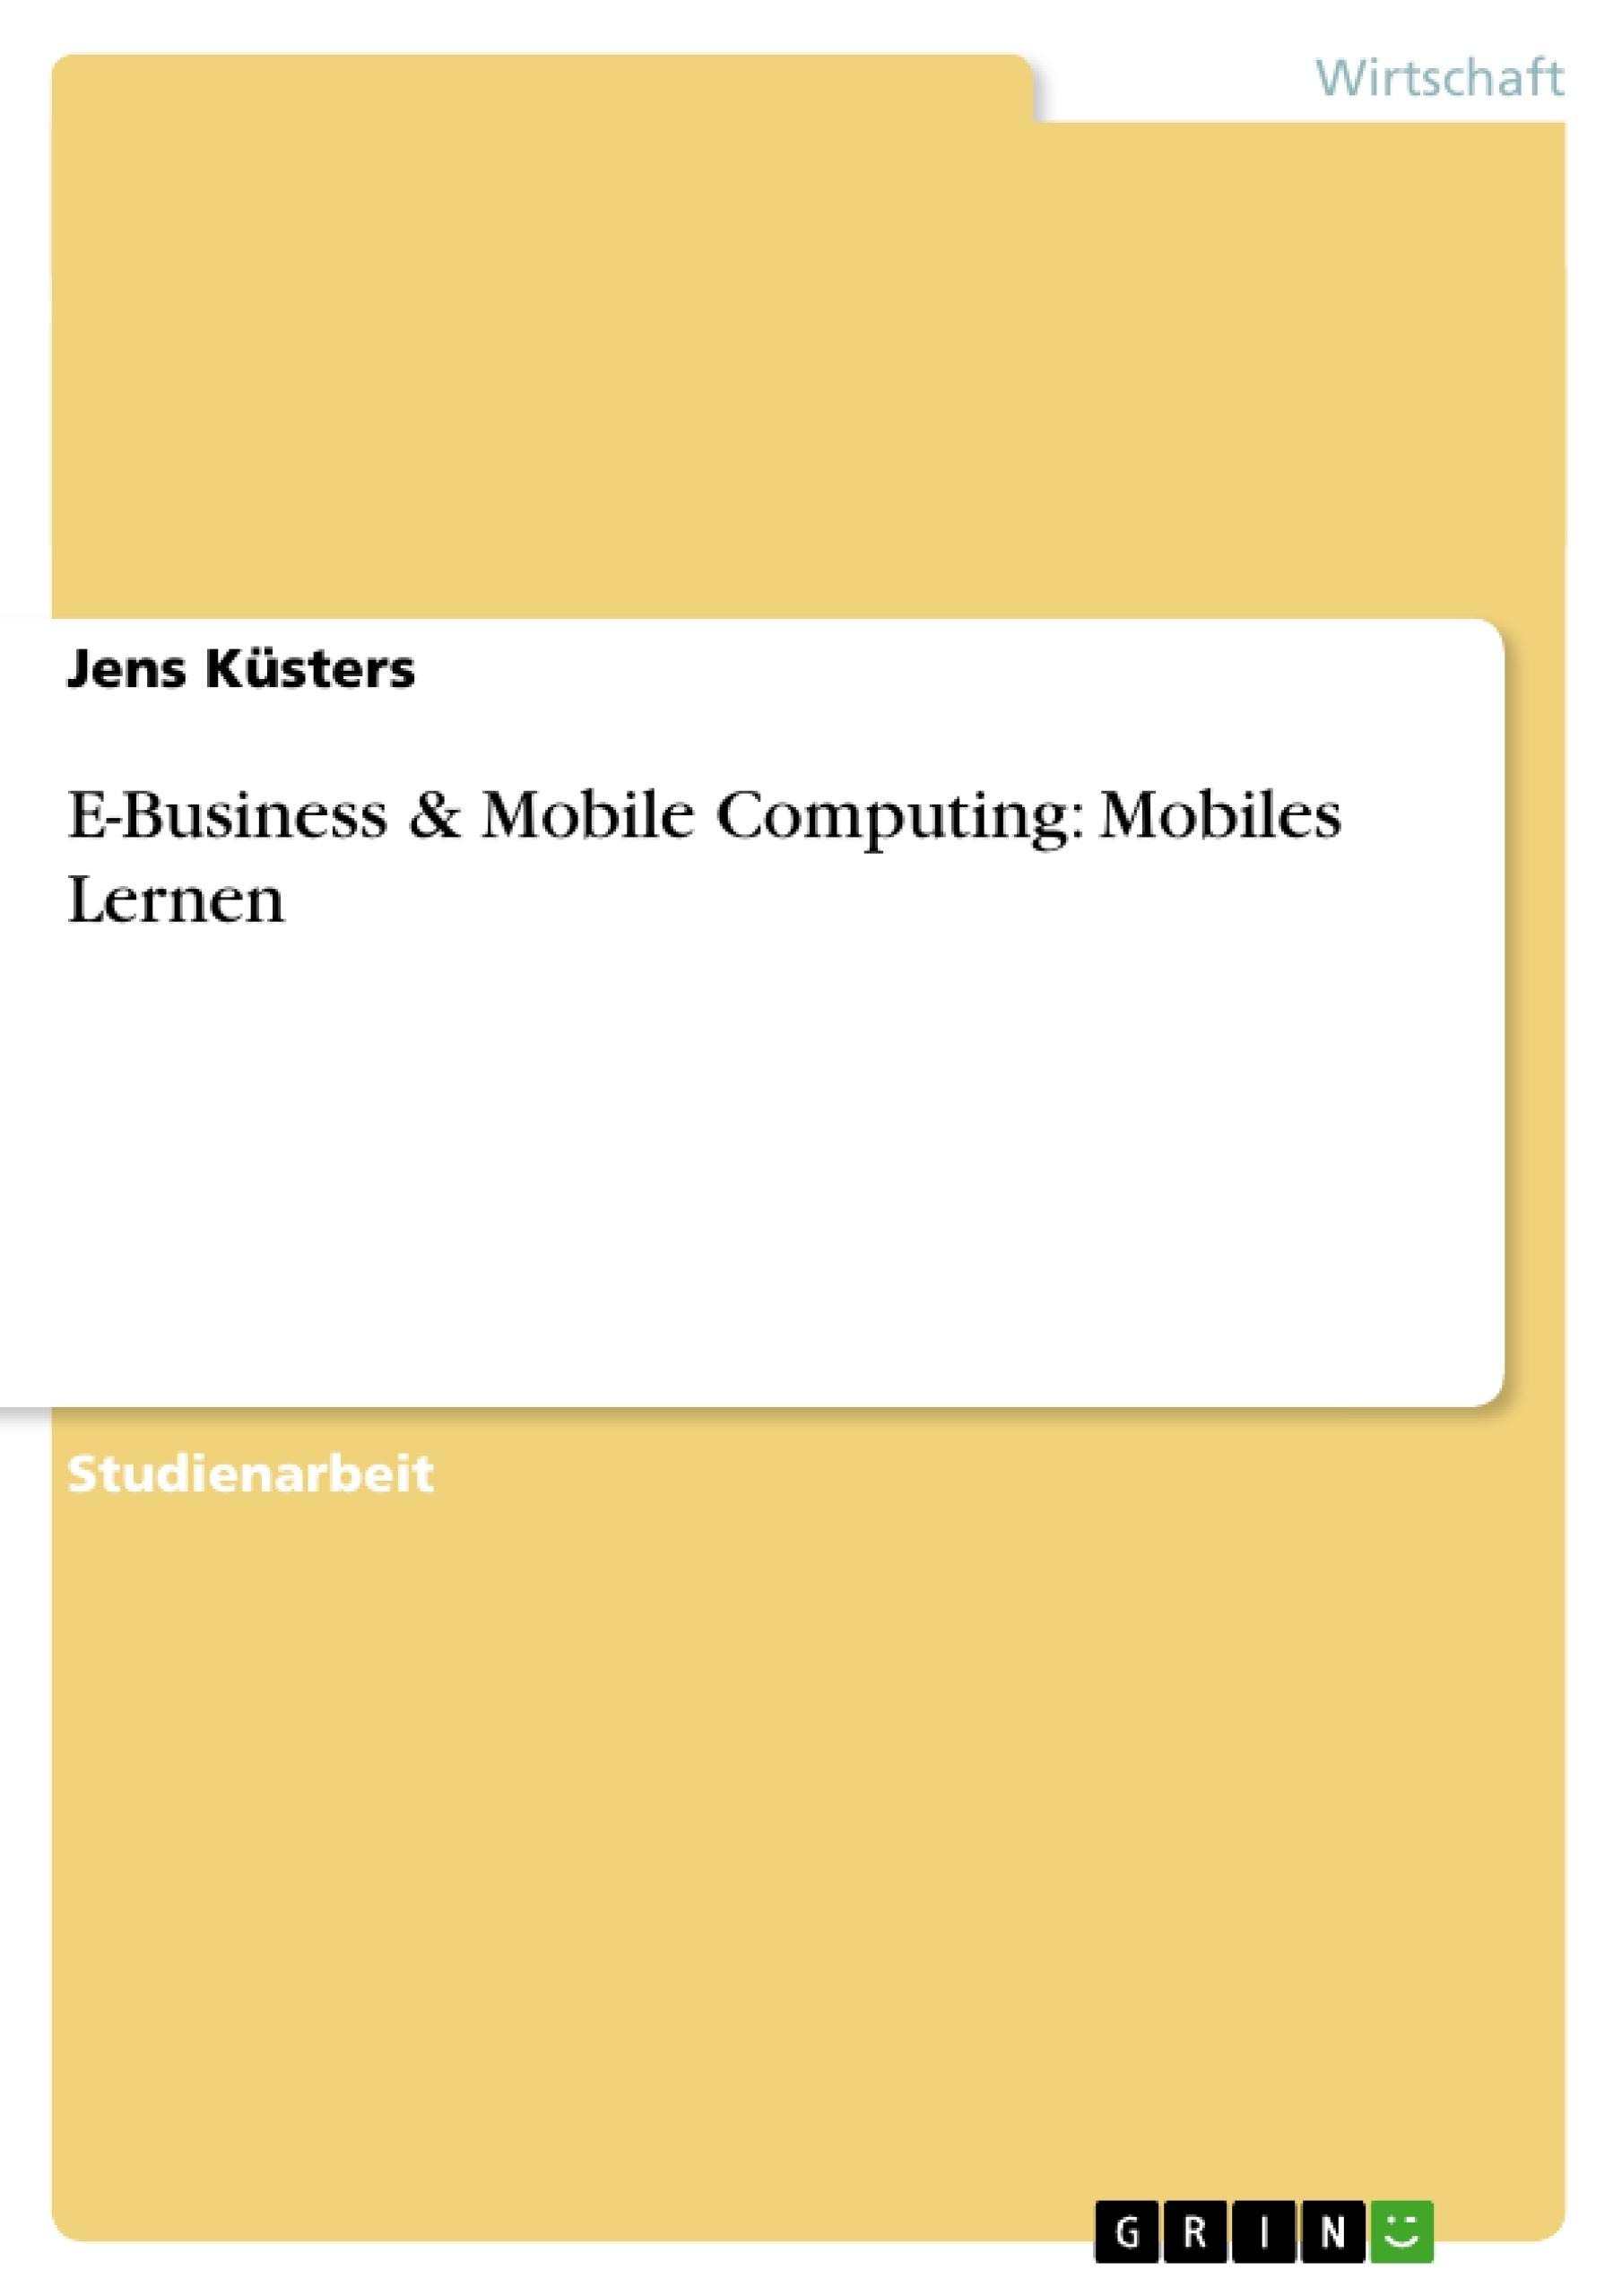 Titel: E-Business & Mobile Computing: Mobiles Lernen